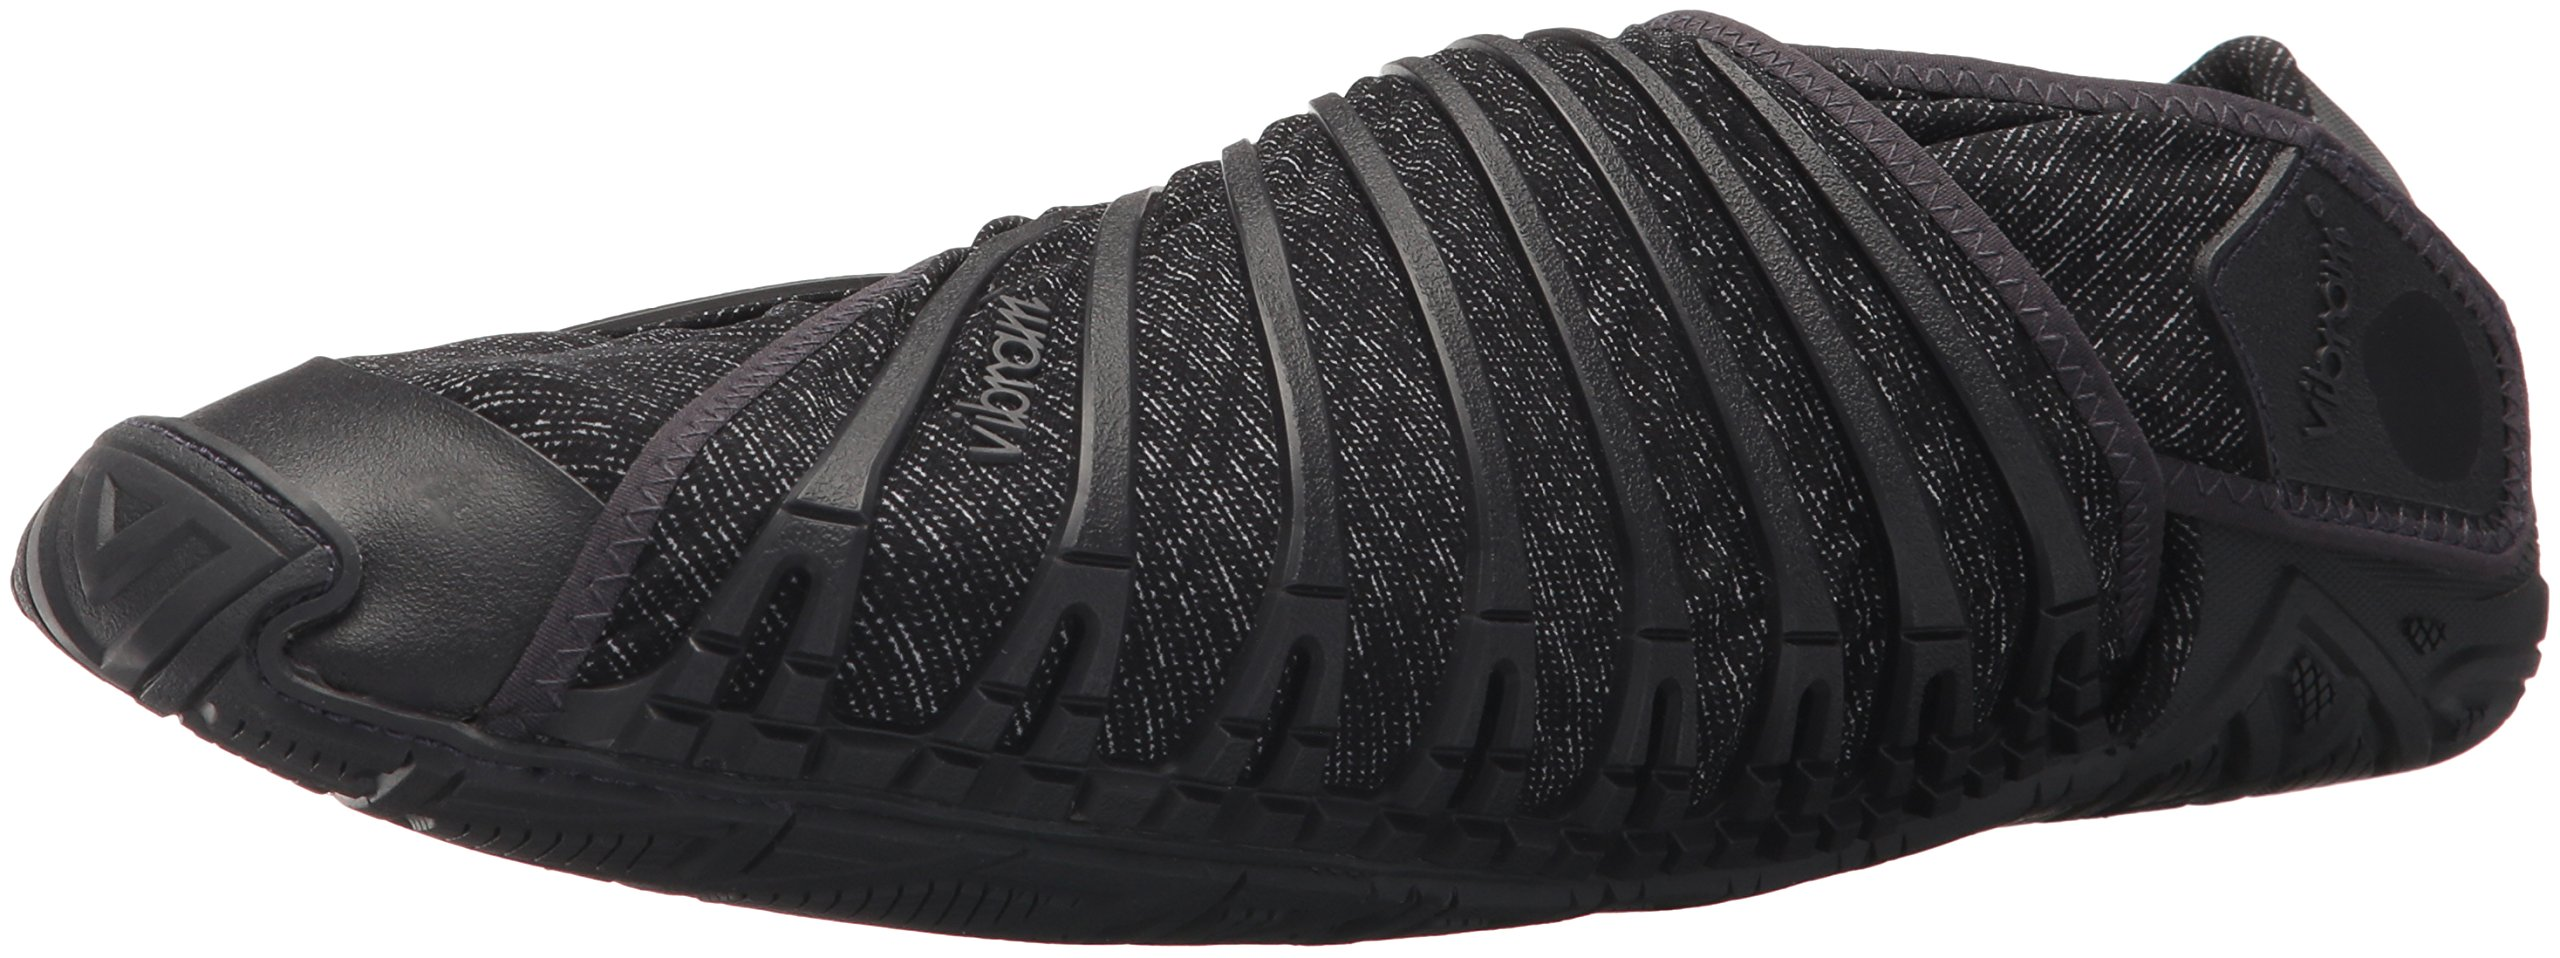 Vibram Men's Furoshiki Sneaker, Dark Jeans, 43 EU/9.5-10 M US D EU (43 EU/9.5-10 US US)